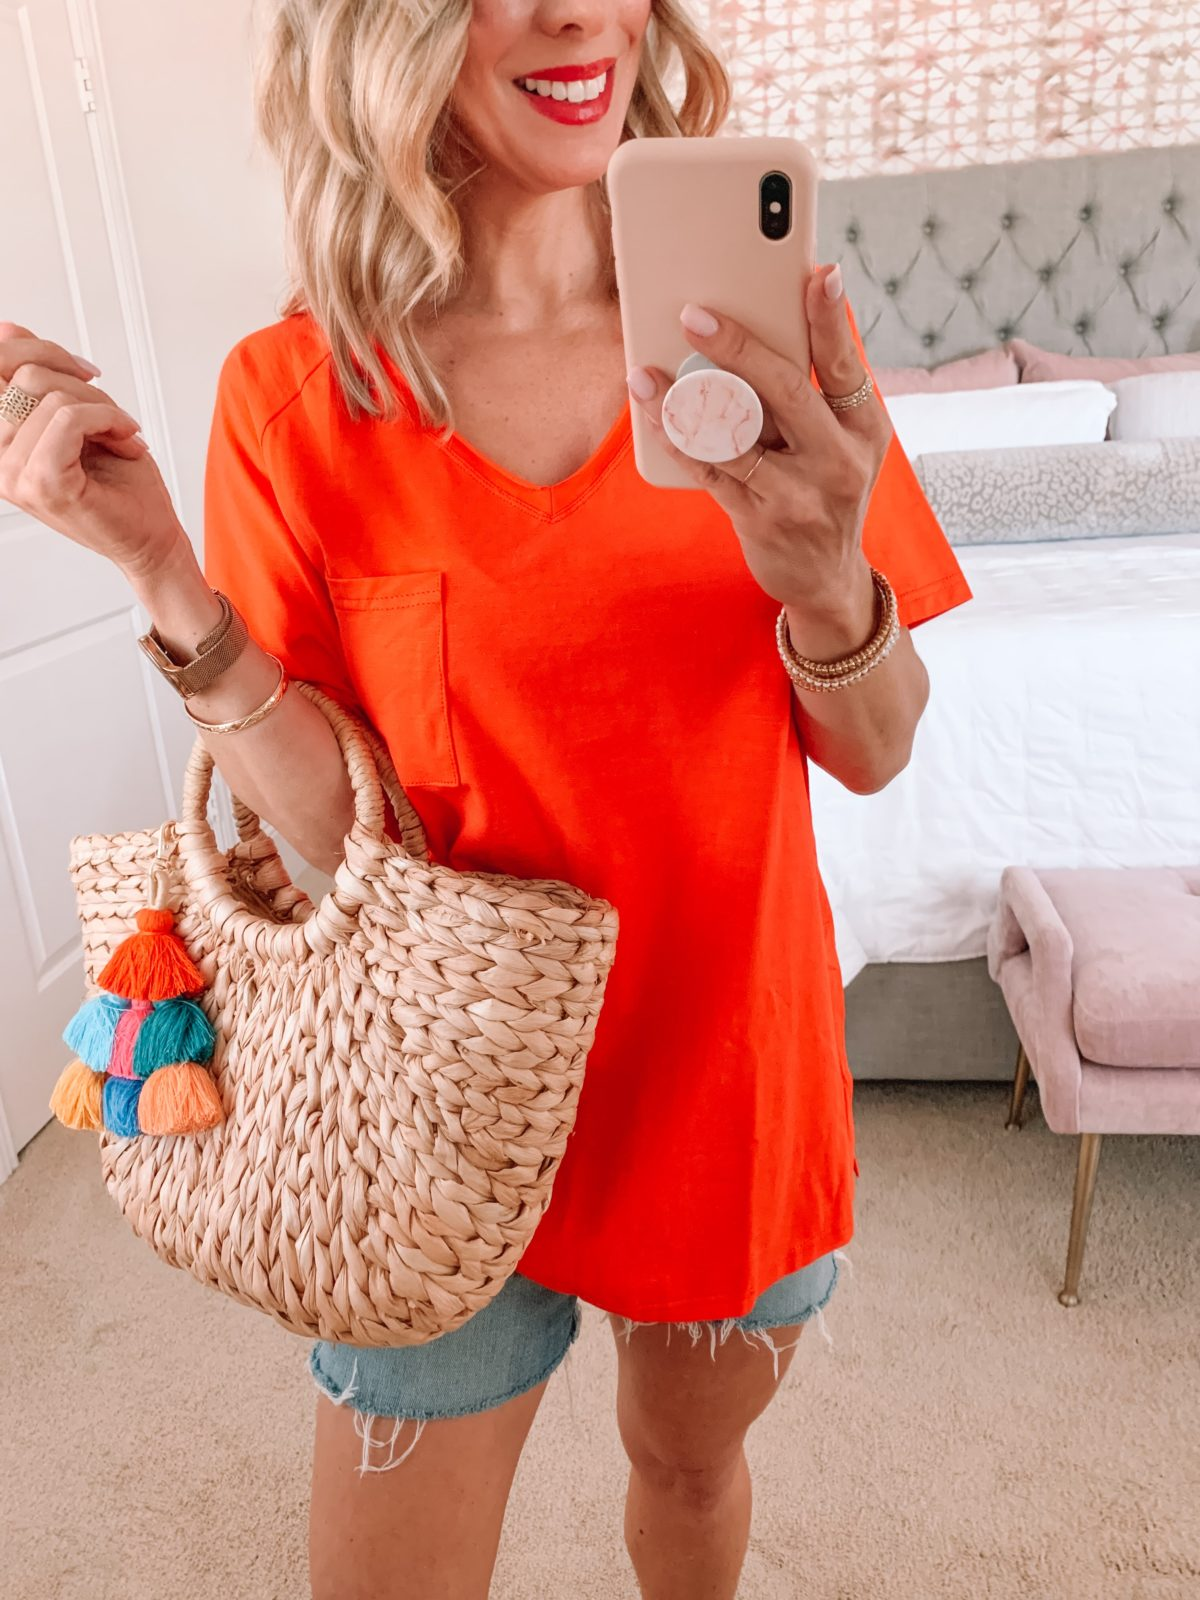 Amazon Fashion Faves, Orange Tee, Denim Shorts, Woven Tote with Tassel